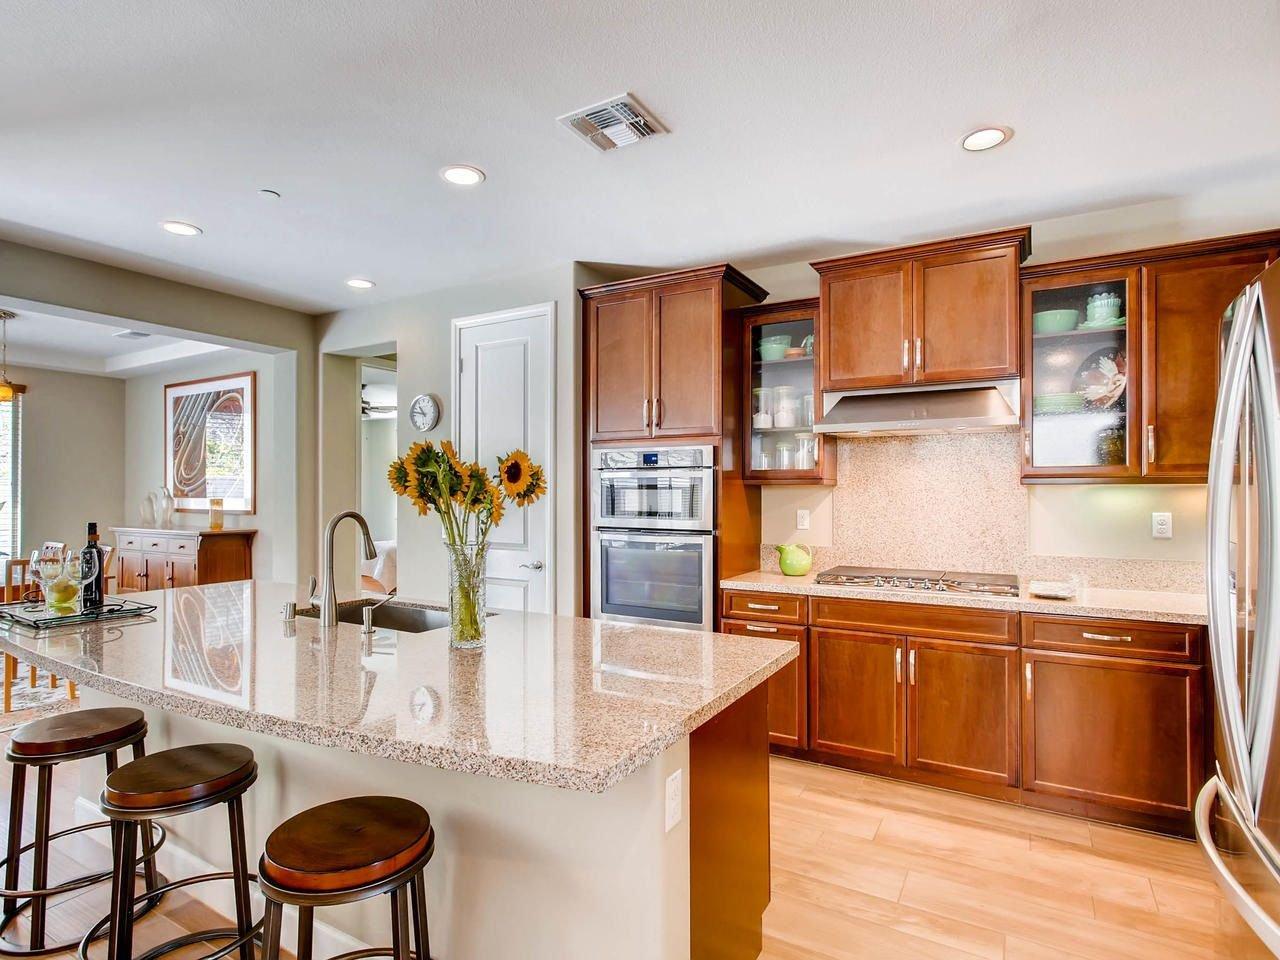 Main Photo: VISTA House for sale : 6 bedrooms : 443 Machado